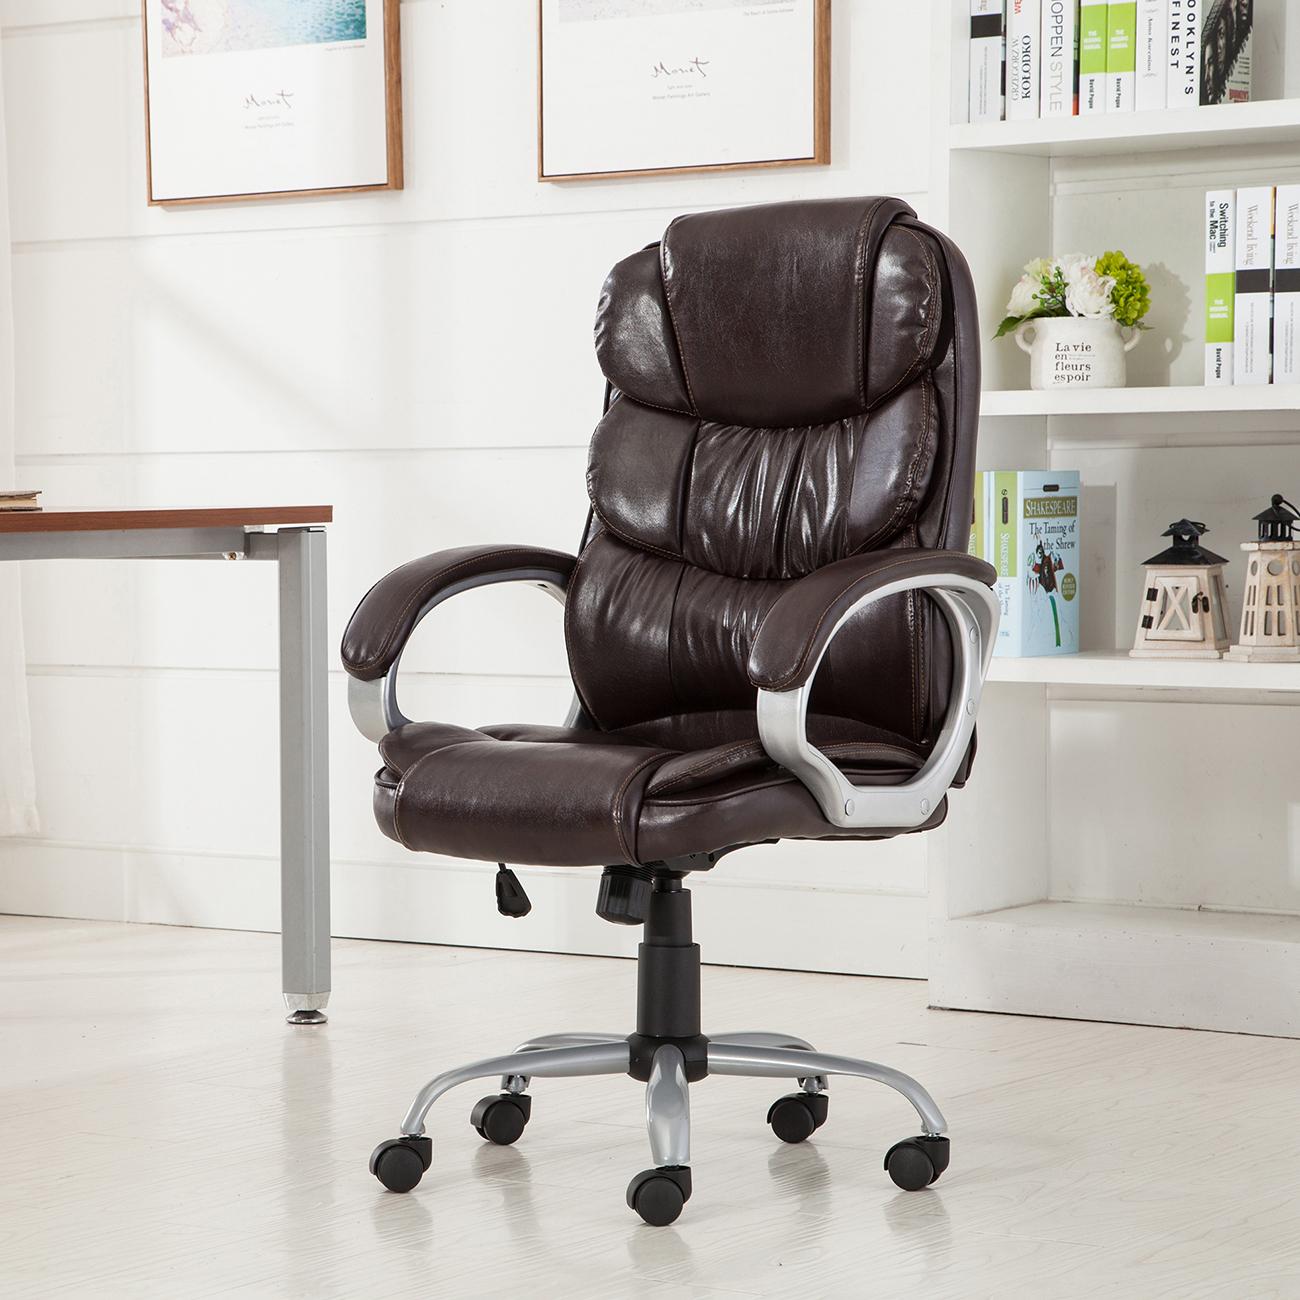 Ergonomic Computer Desk Mocha Pu Leather High Back Office Chair Executive Task Ergonomic